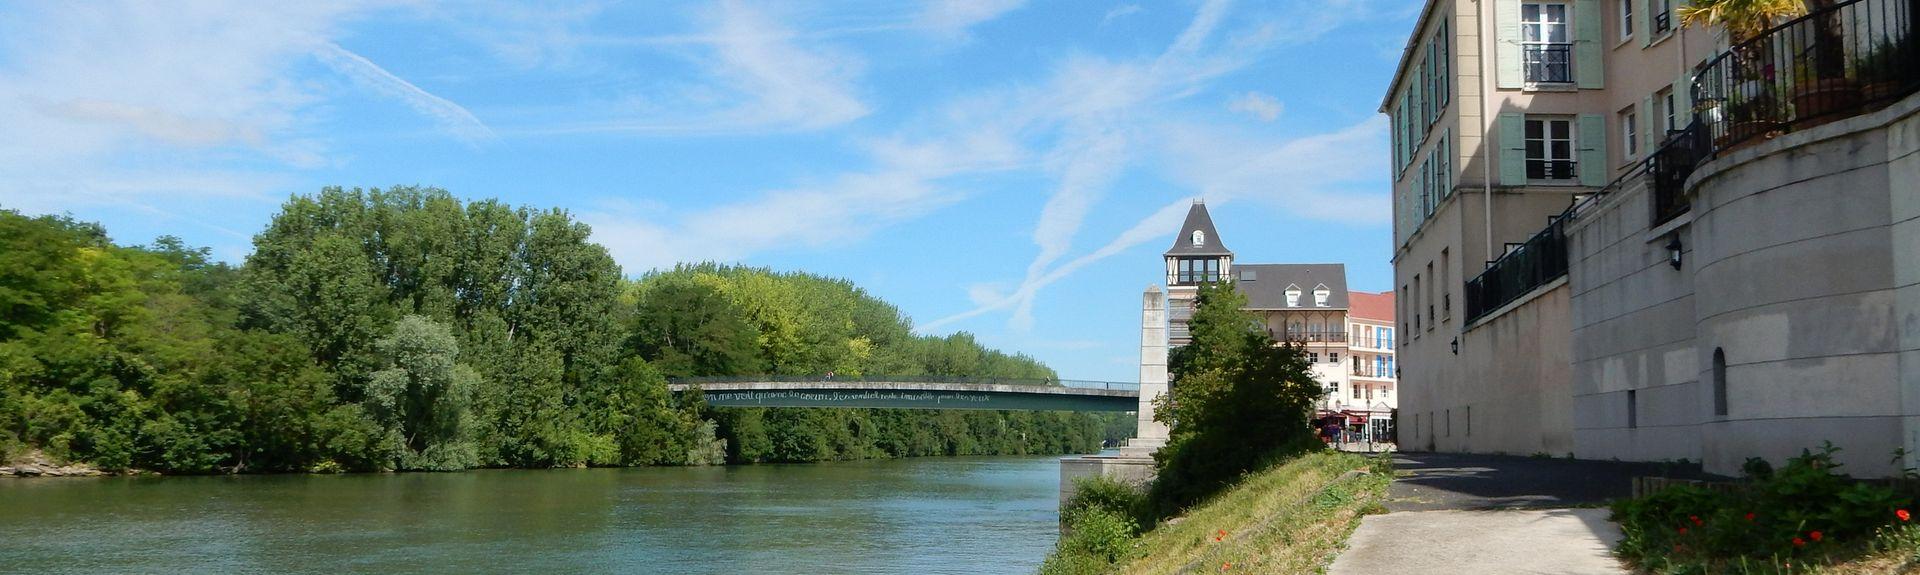 Éragny, France